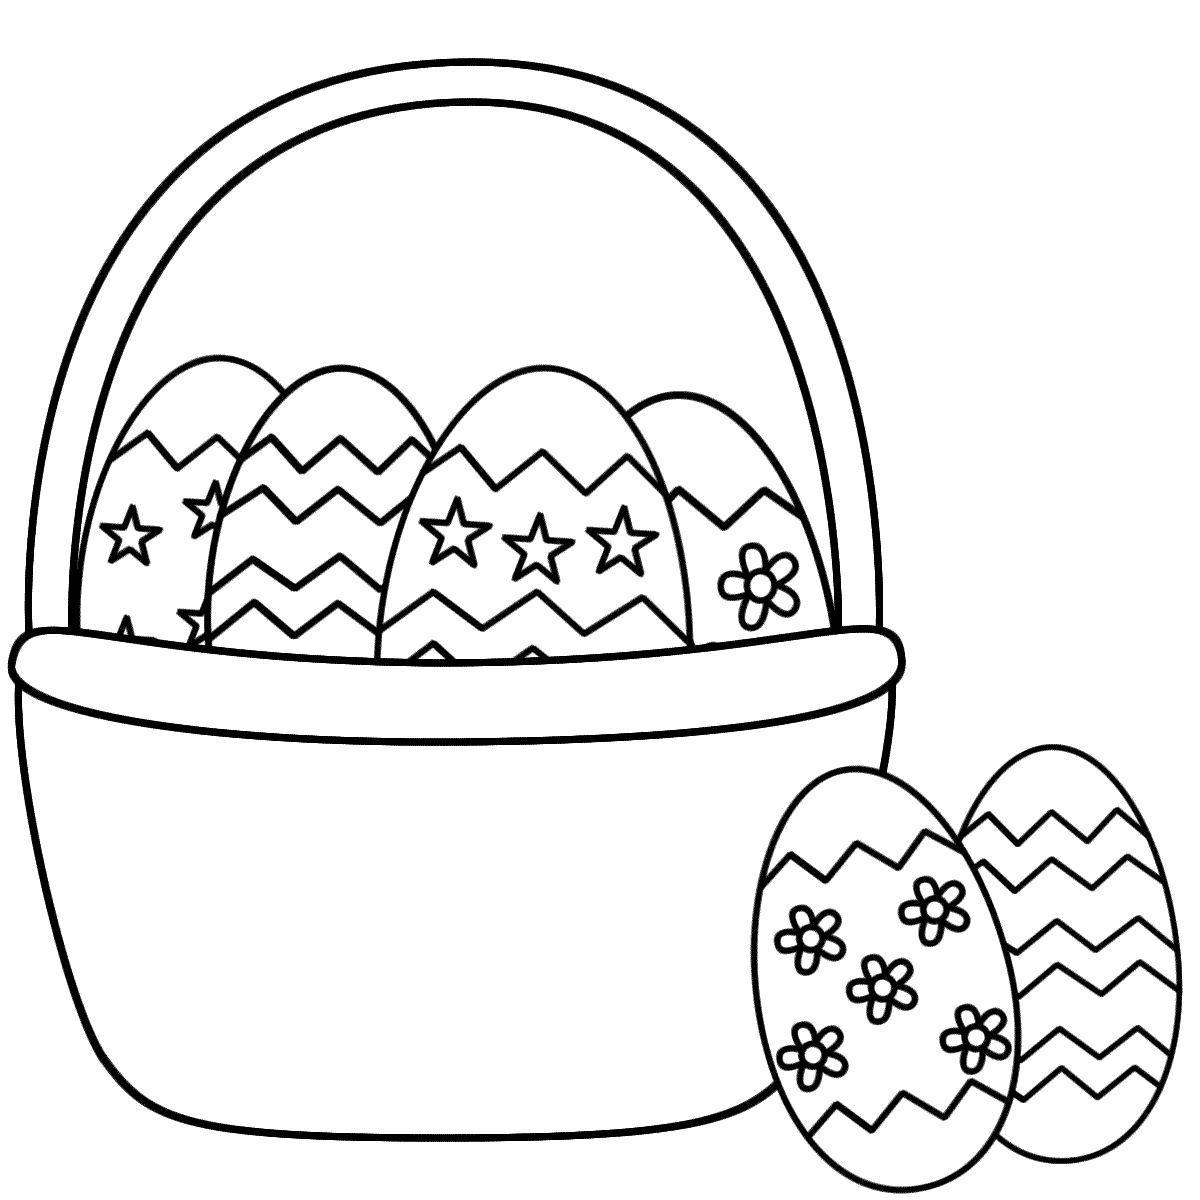 Easter Egg Basket Coloring Pages 16 1200